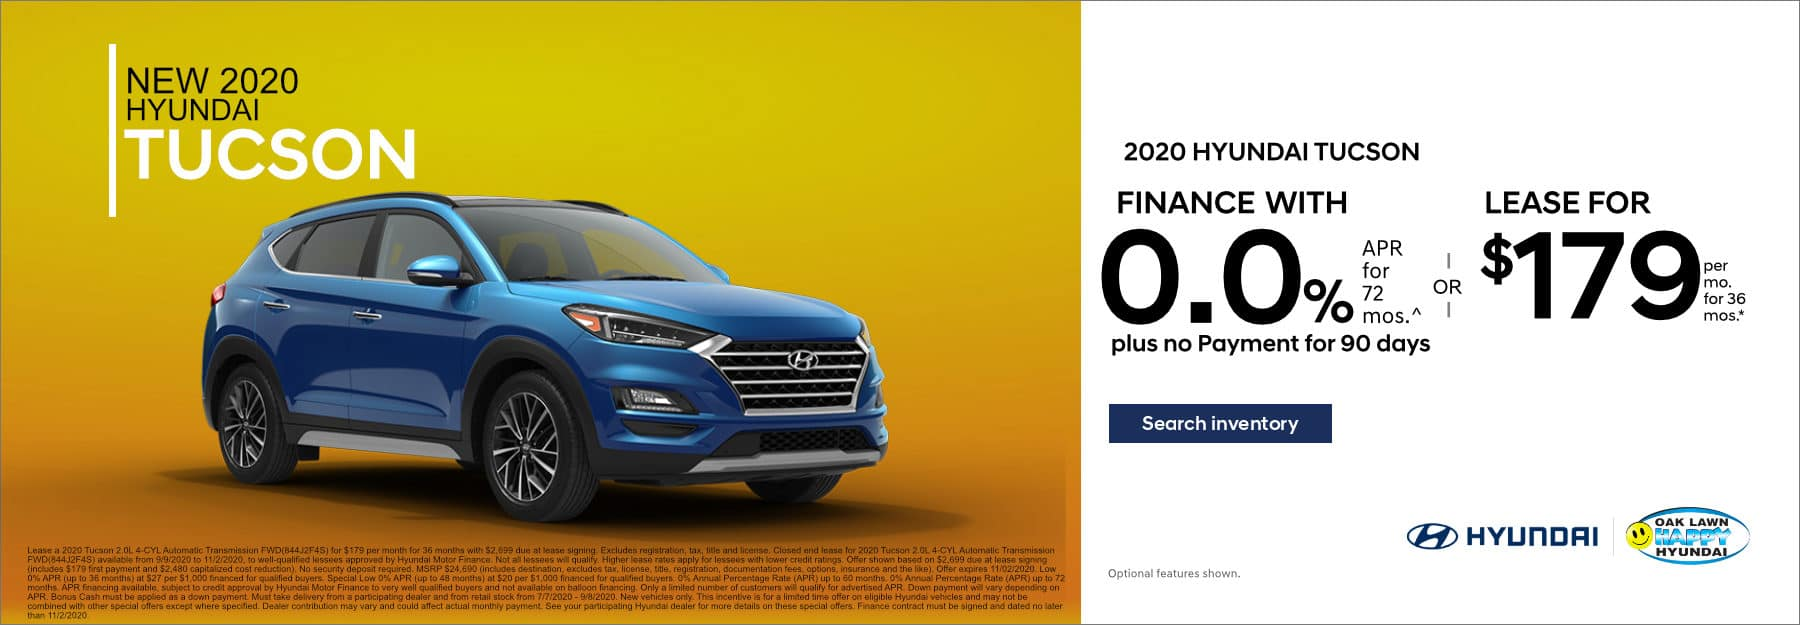 R_October-2020 TUCSON_Happy_Hyundai_1400x514